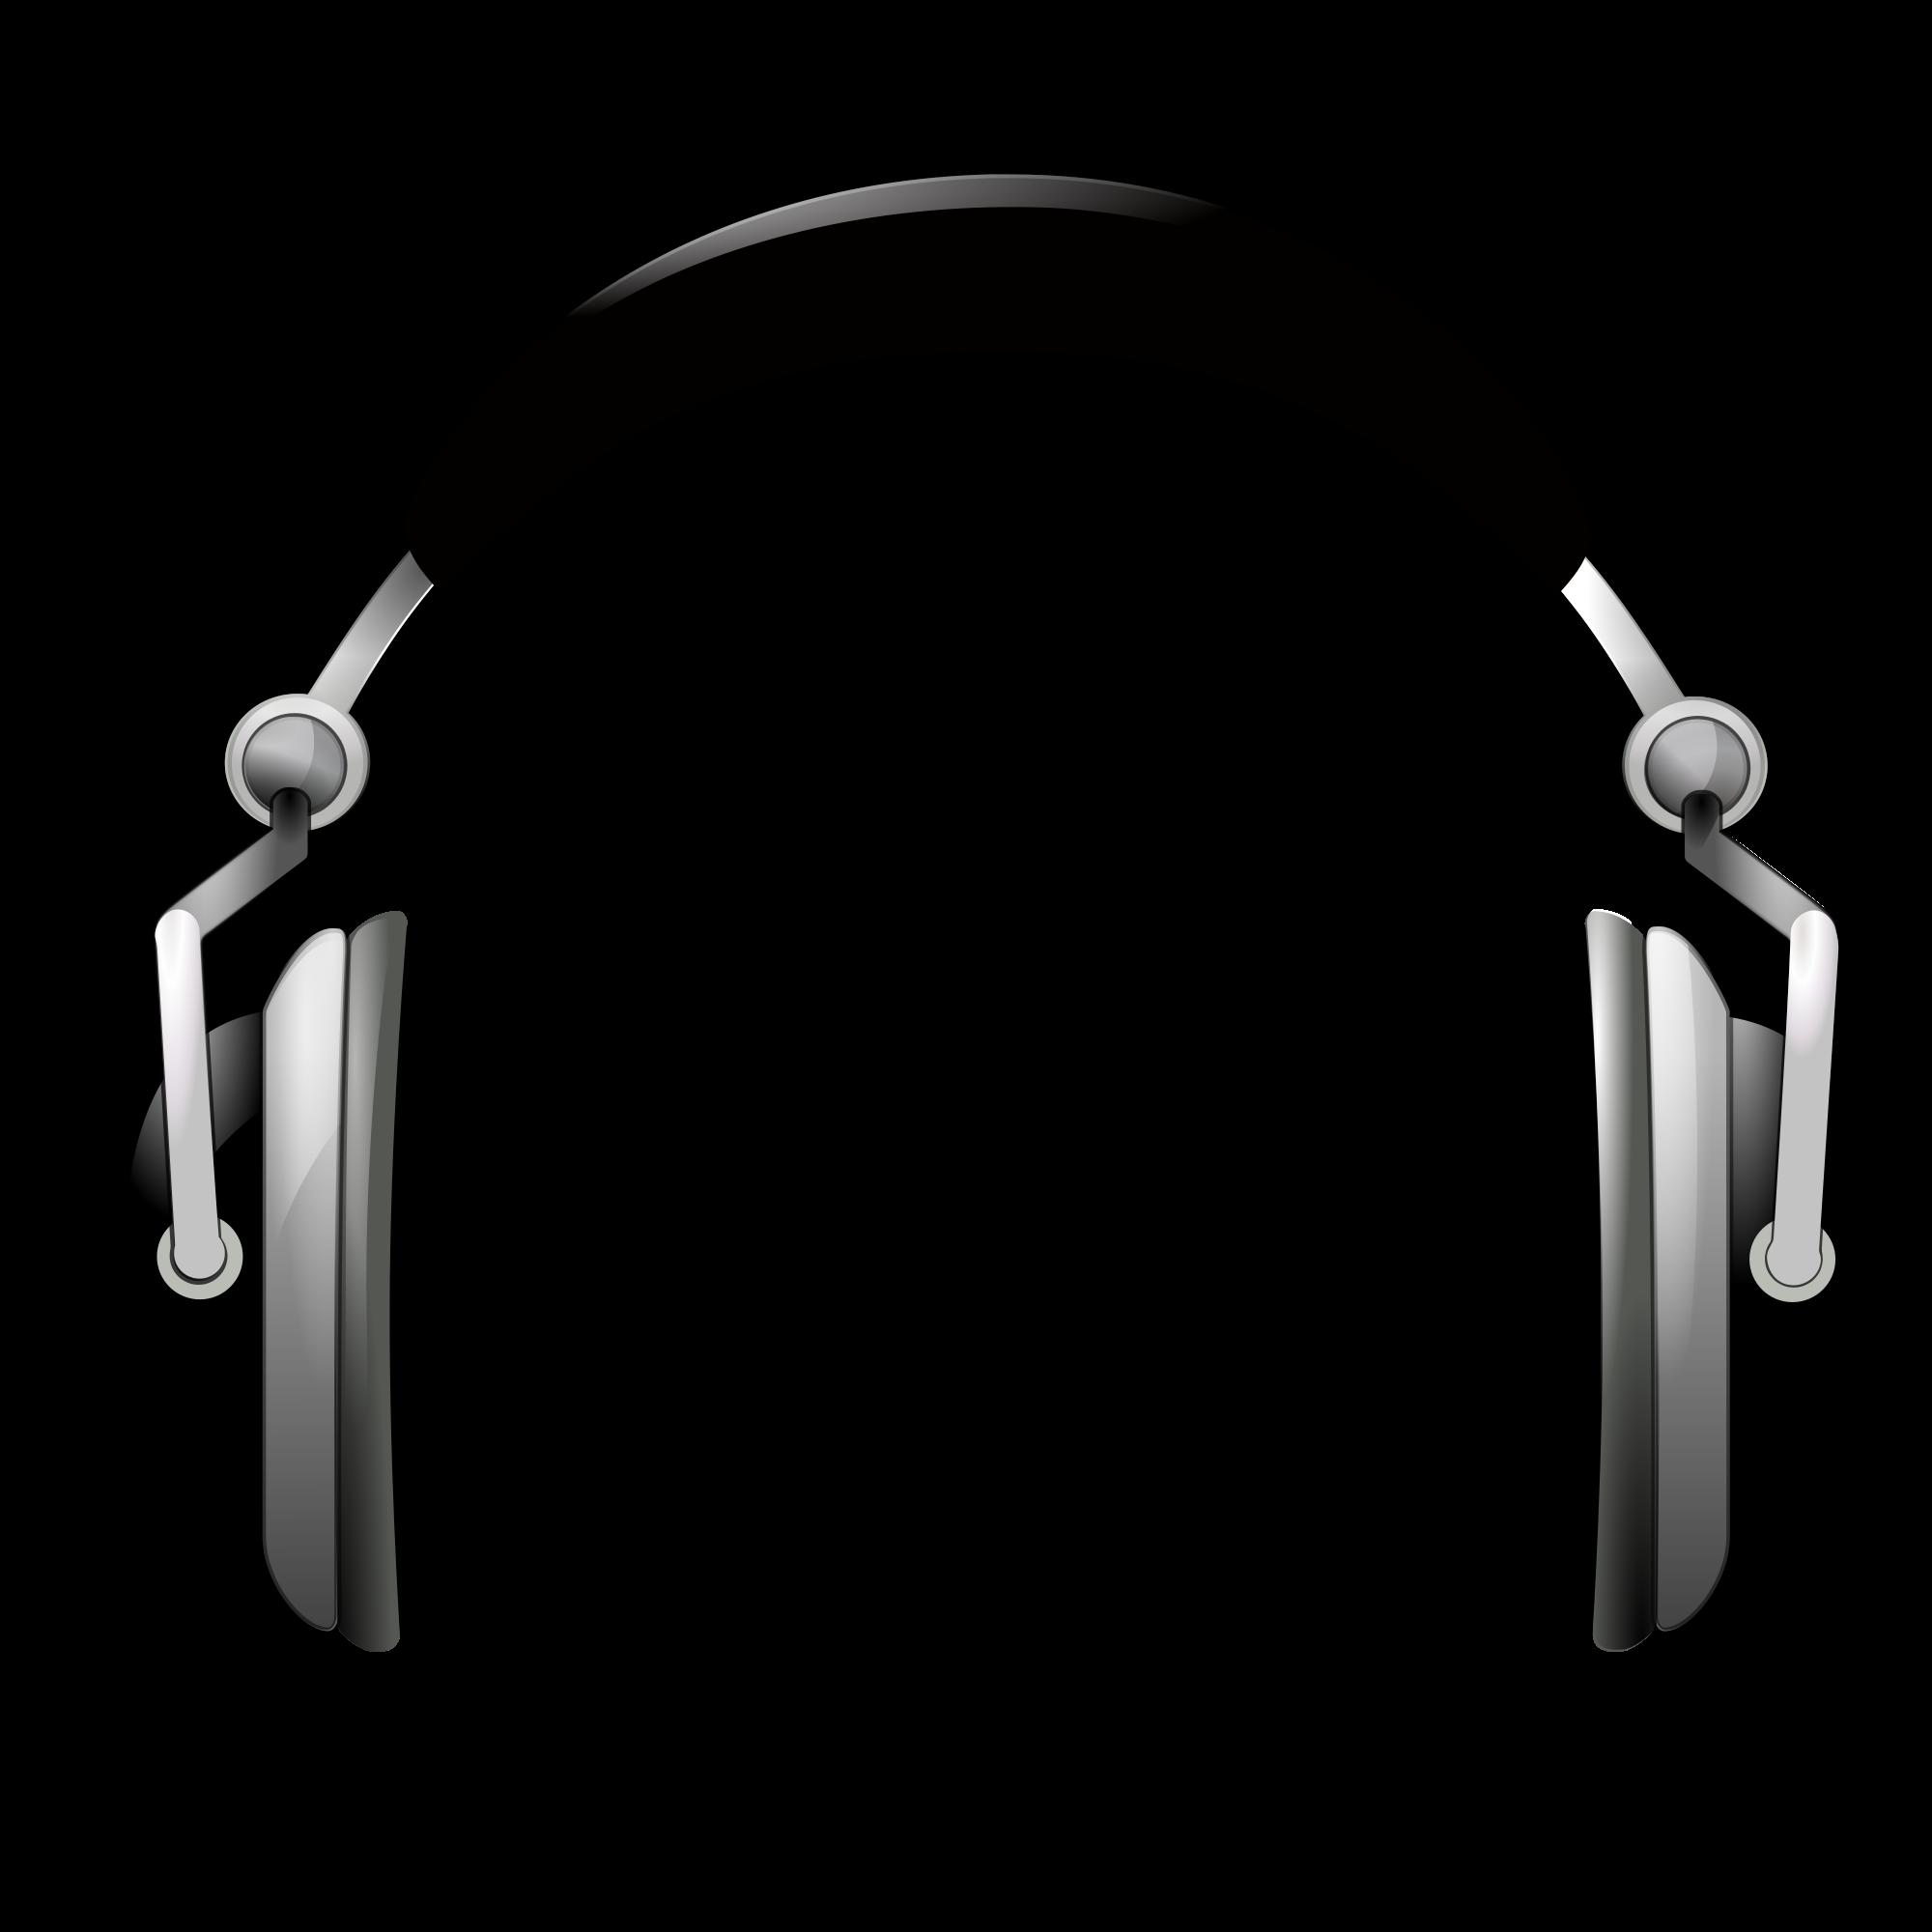 Headphones Picture PNG Image - Headphones HD PNG